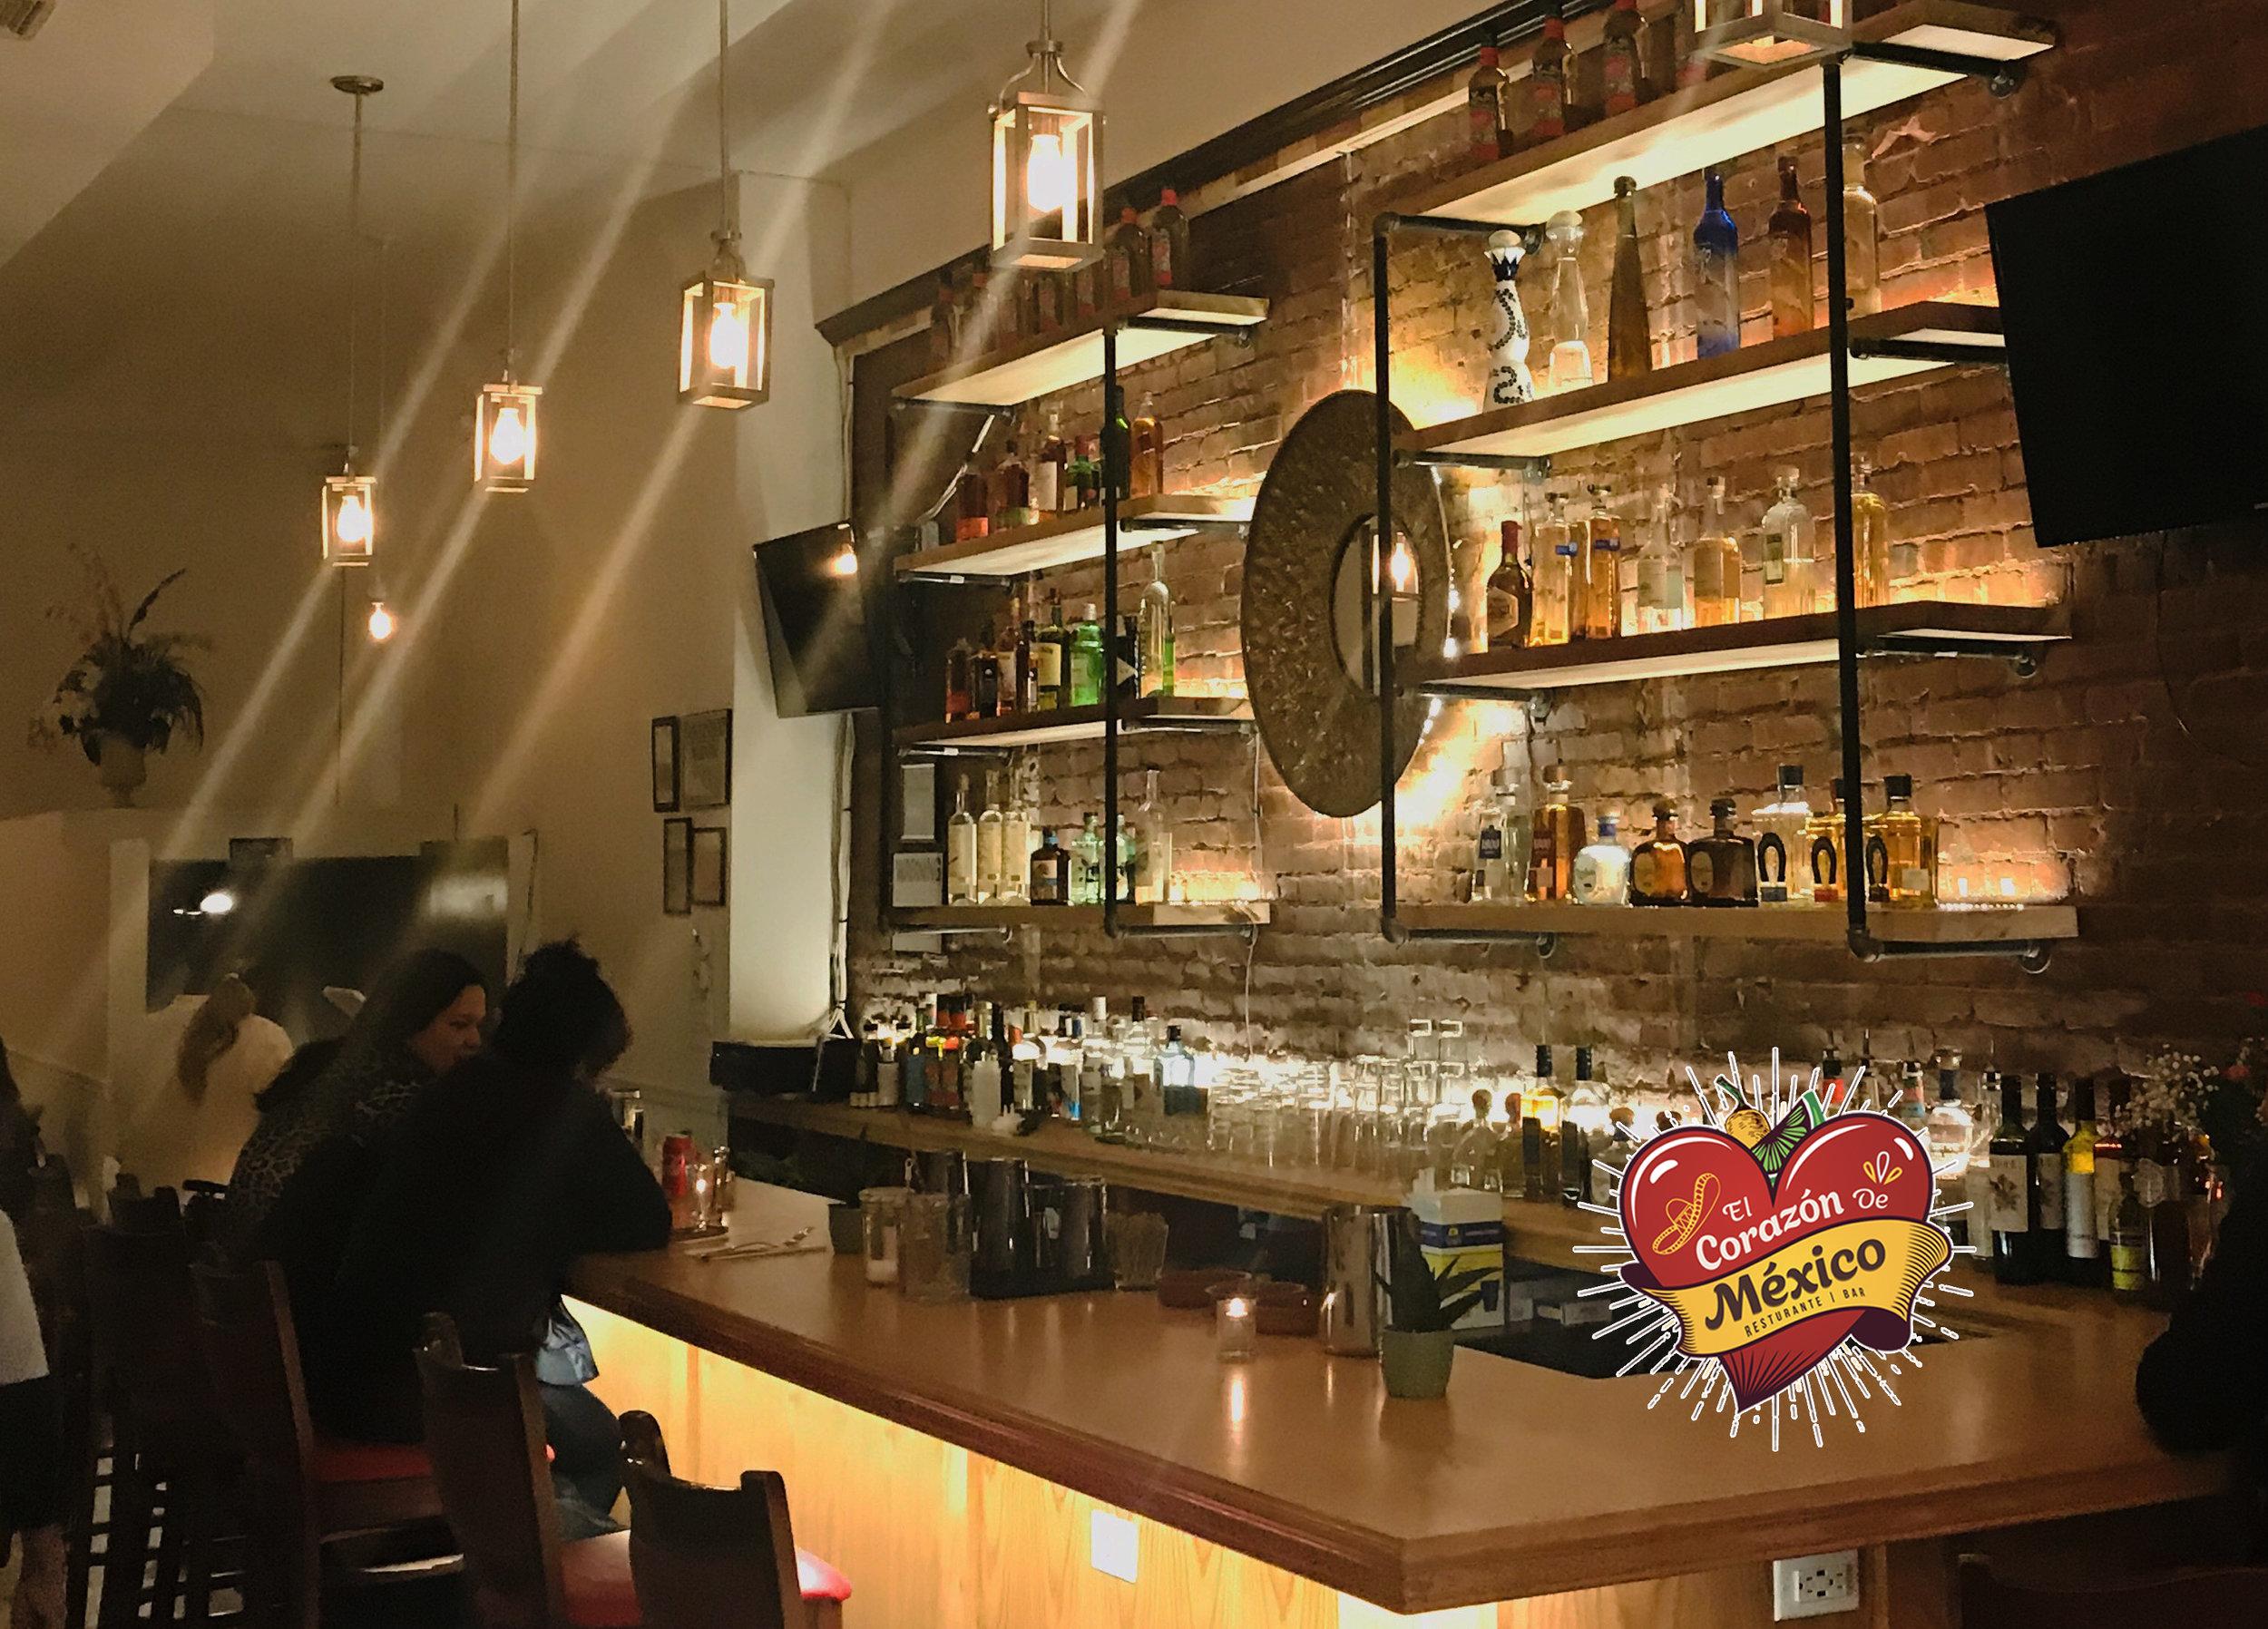 Corazon bar wl.jpg